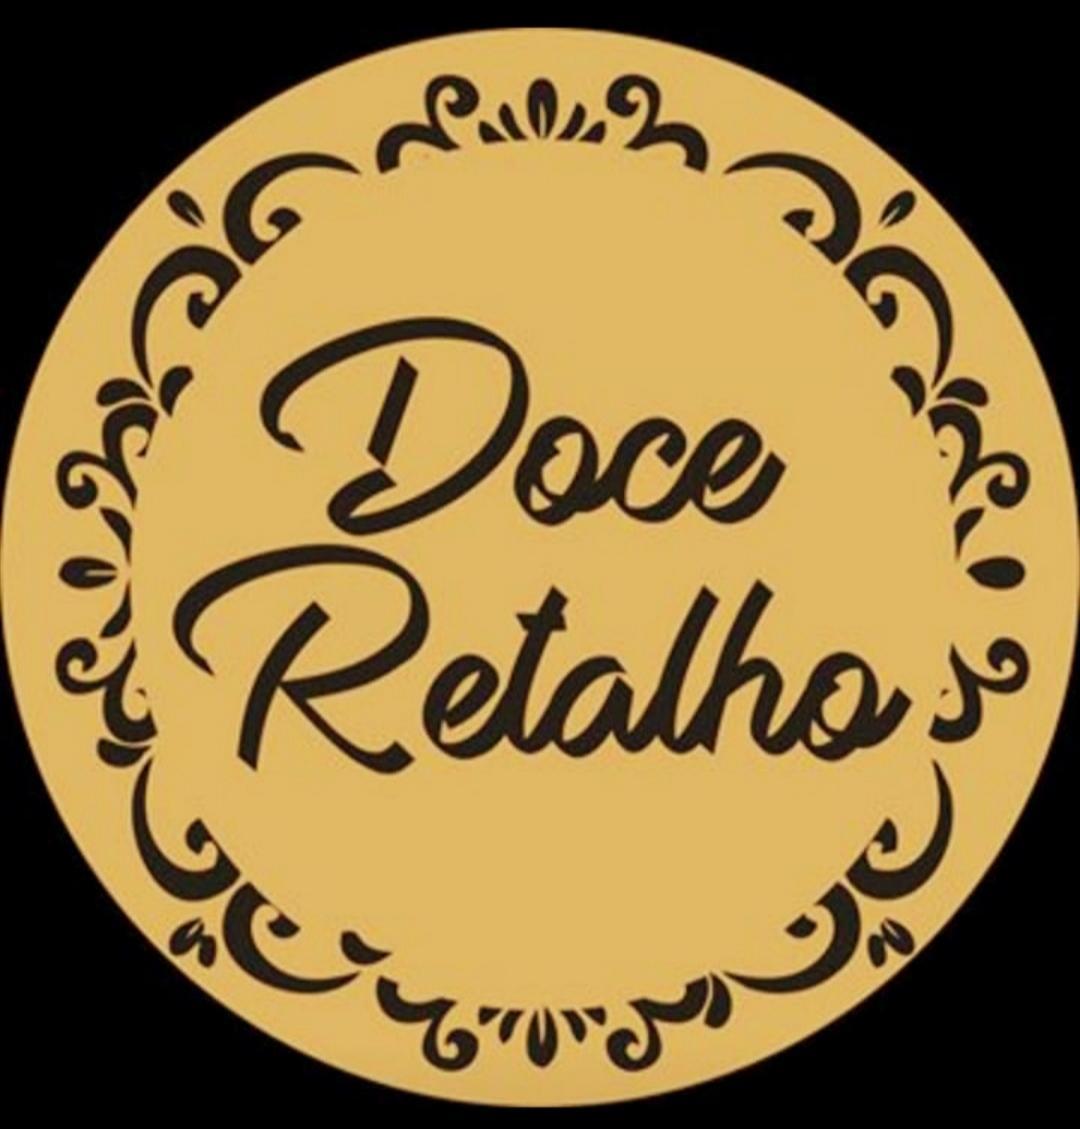 Doce Retalho